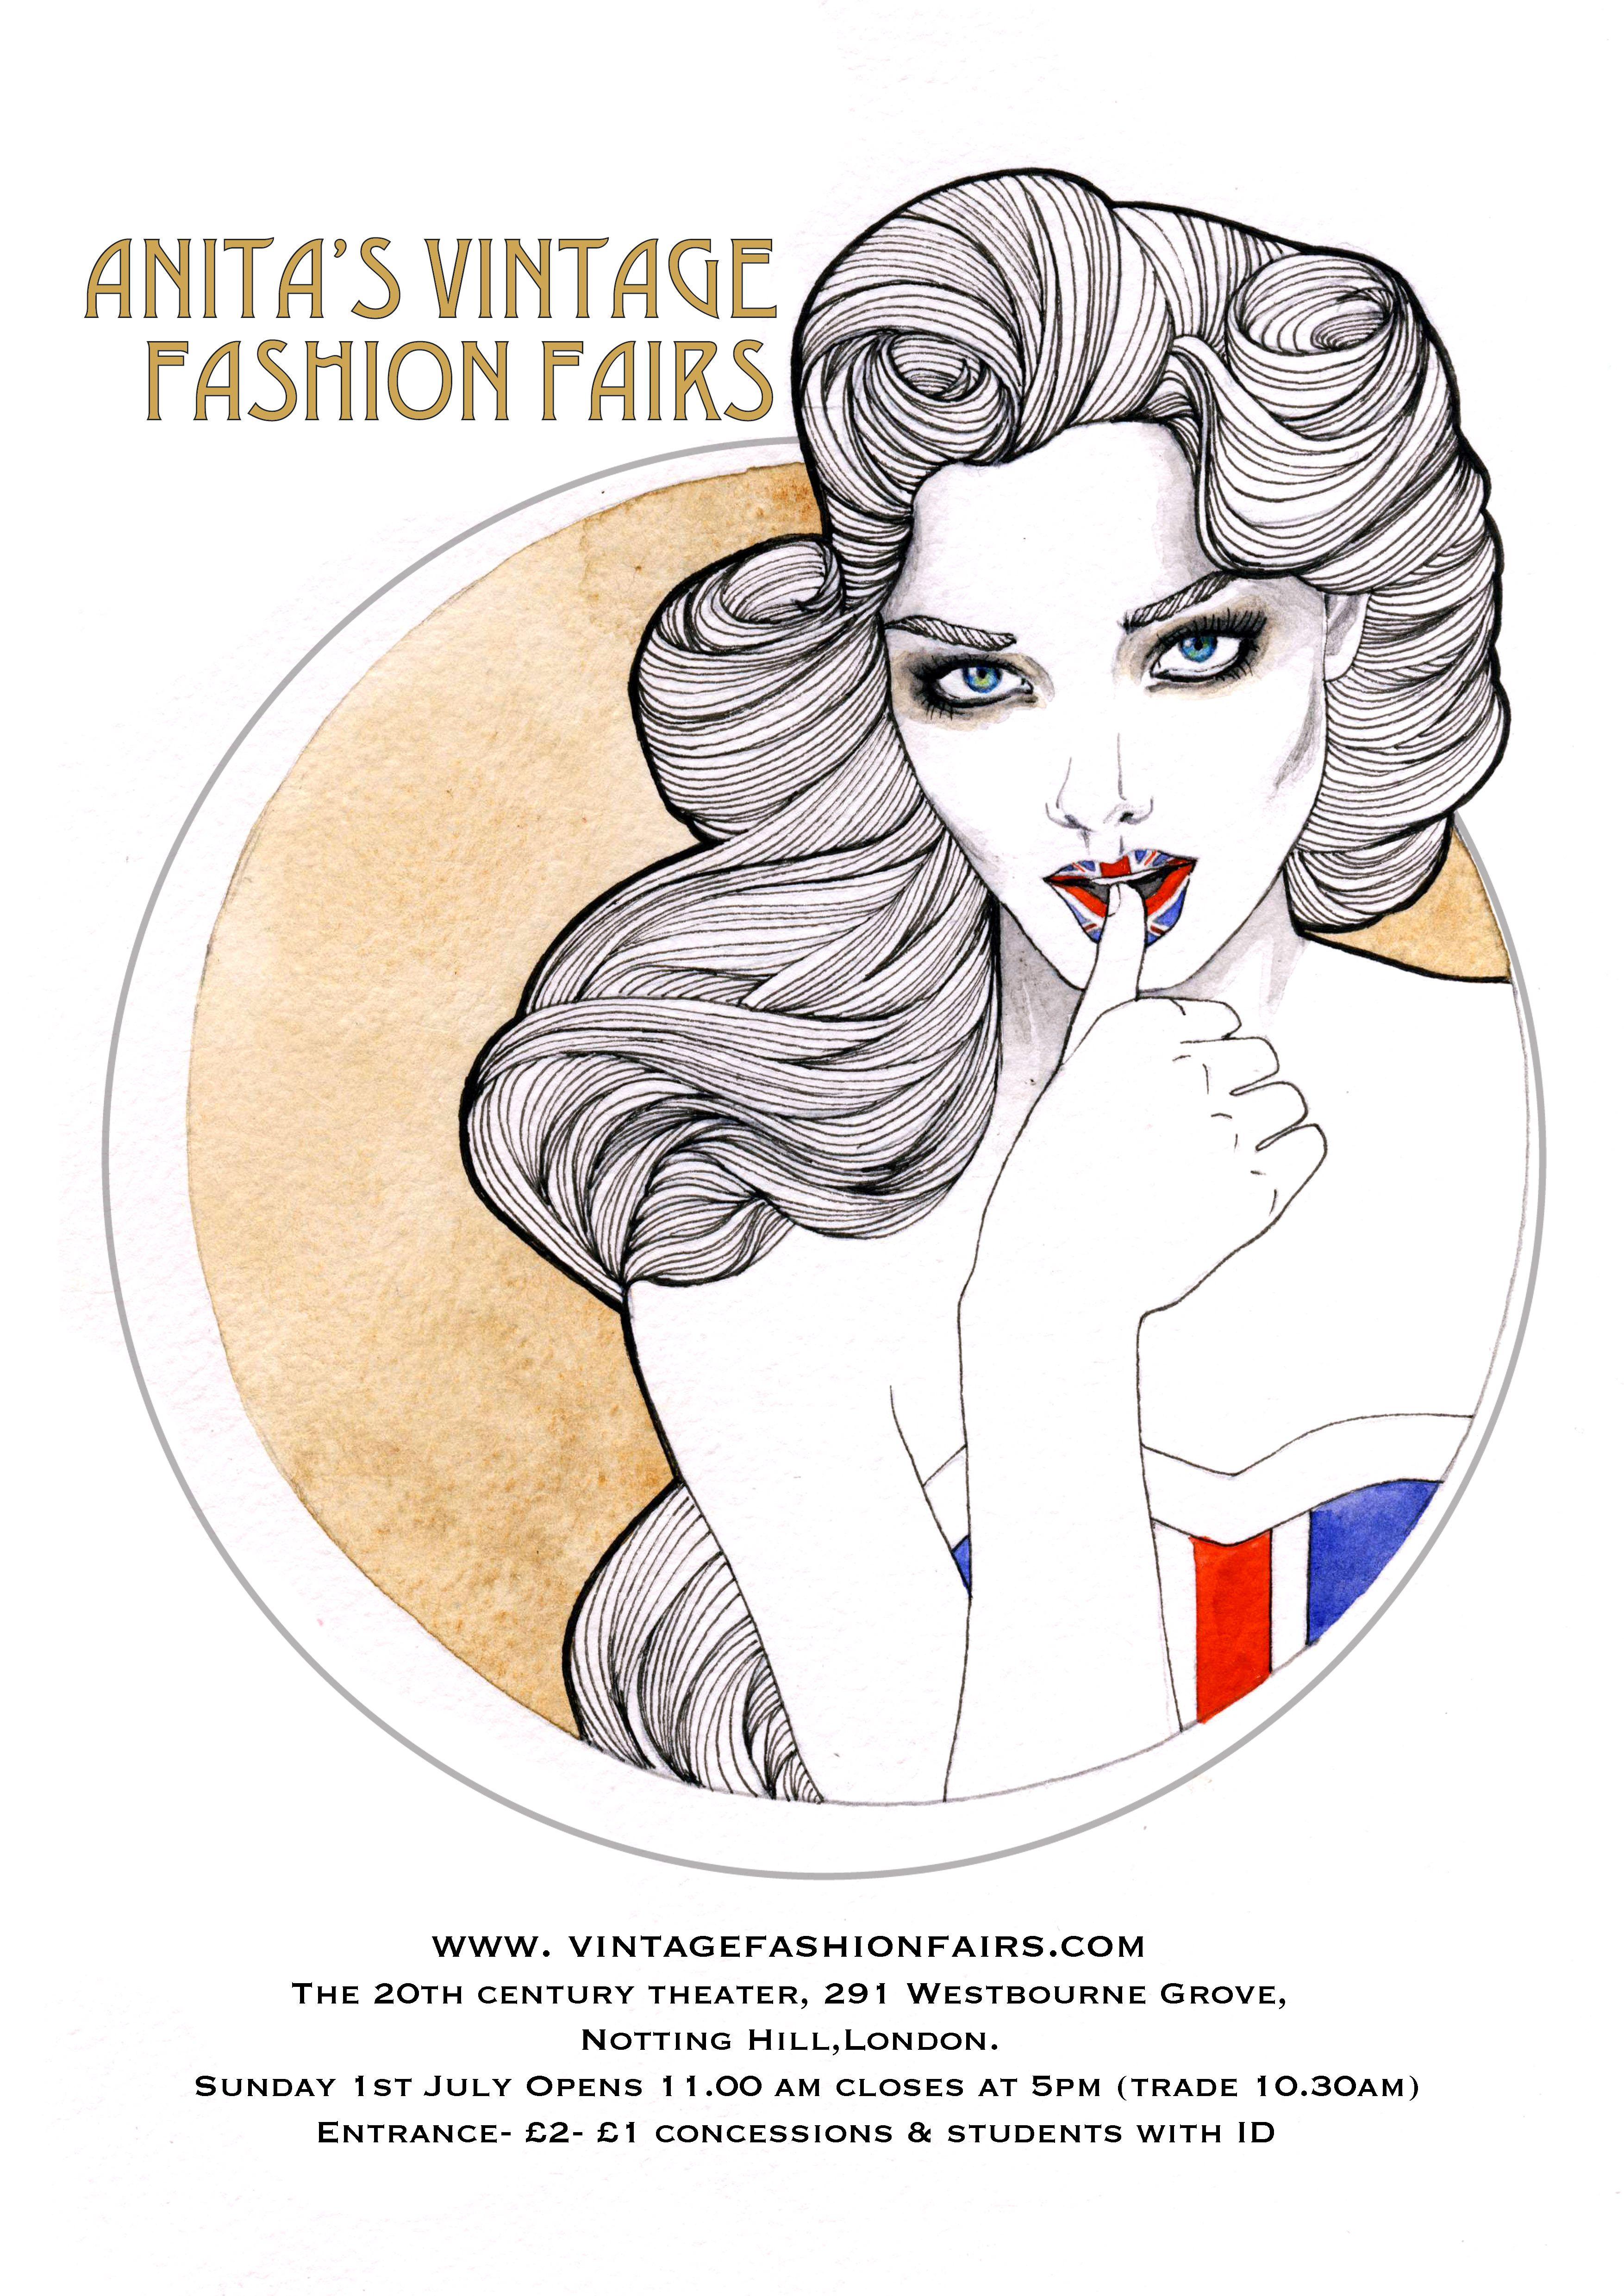 Anita S Vintage Fashion Fair July 1st Poster Designed By Madalen Dixon Www Madalendixon Co Uk Vintage Fashion Poster Design Vintage